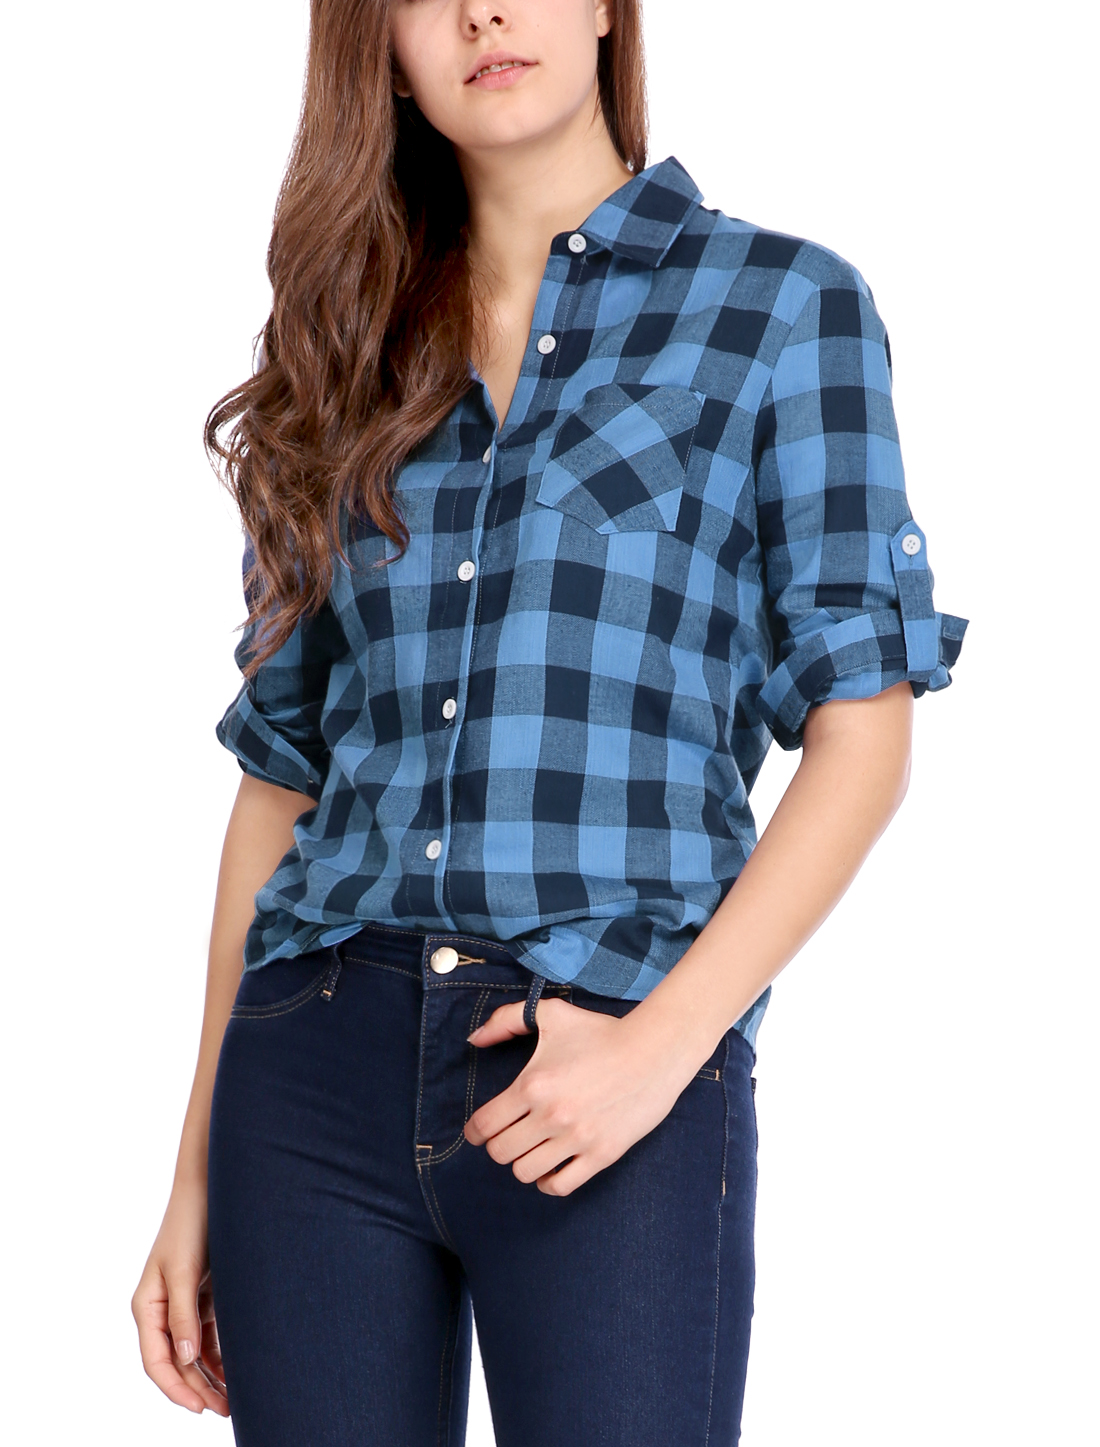 Ladies Point Collar Long Sleeves Button Placket Plaid Shirt Black Blue L